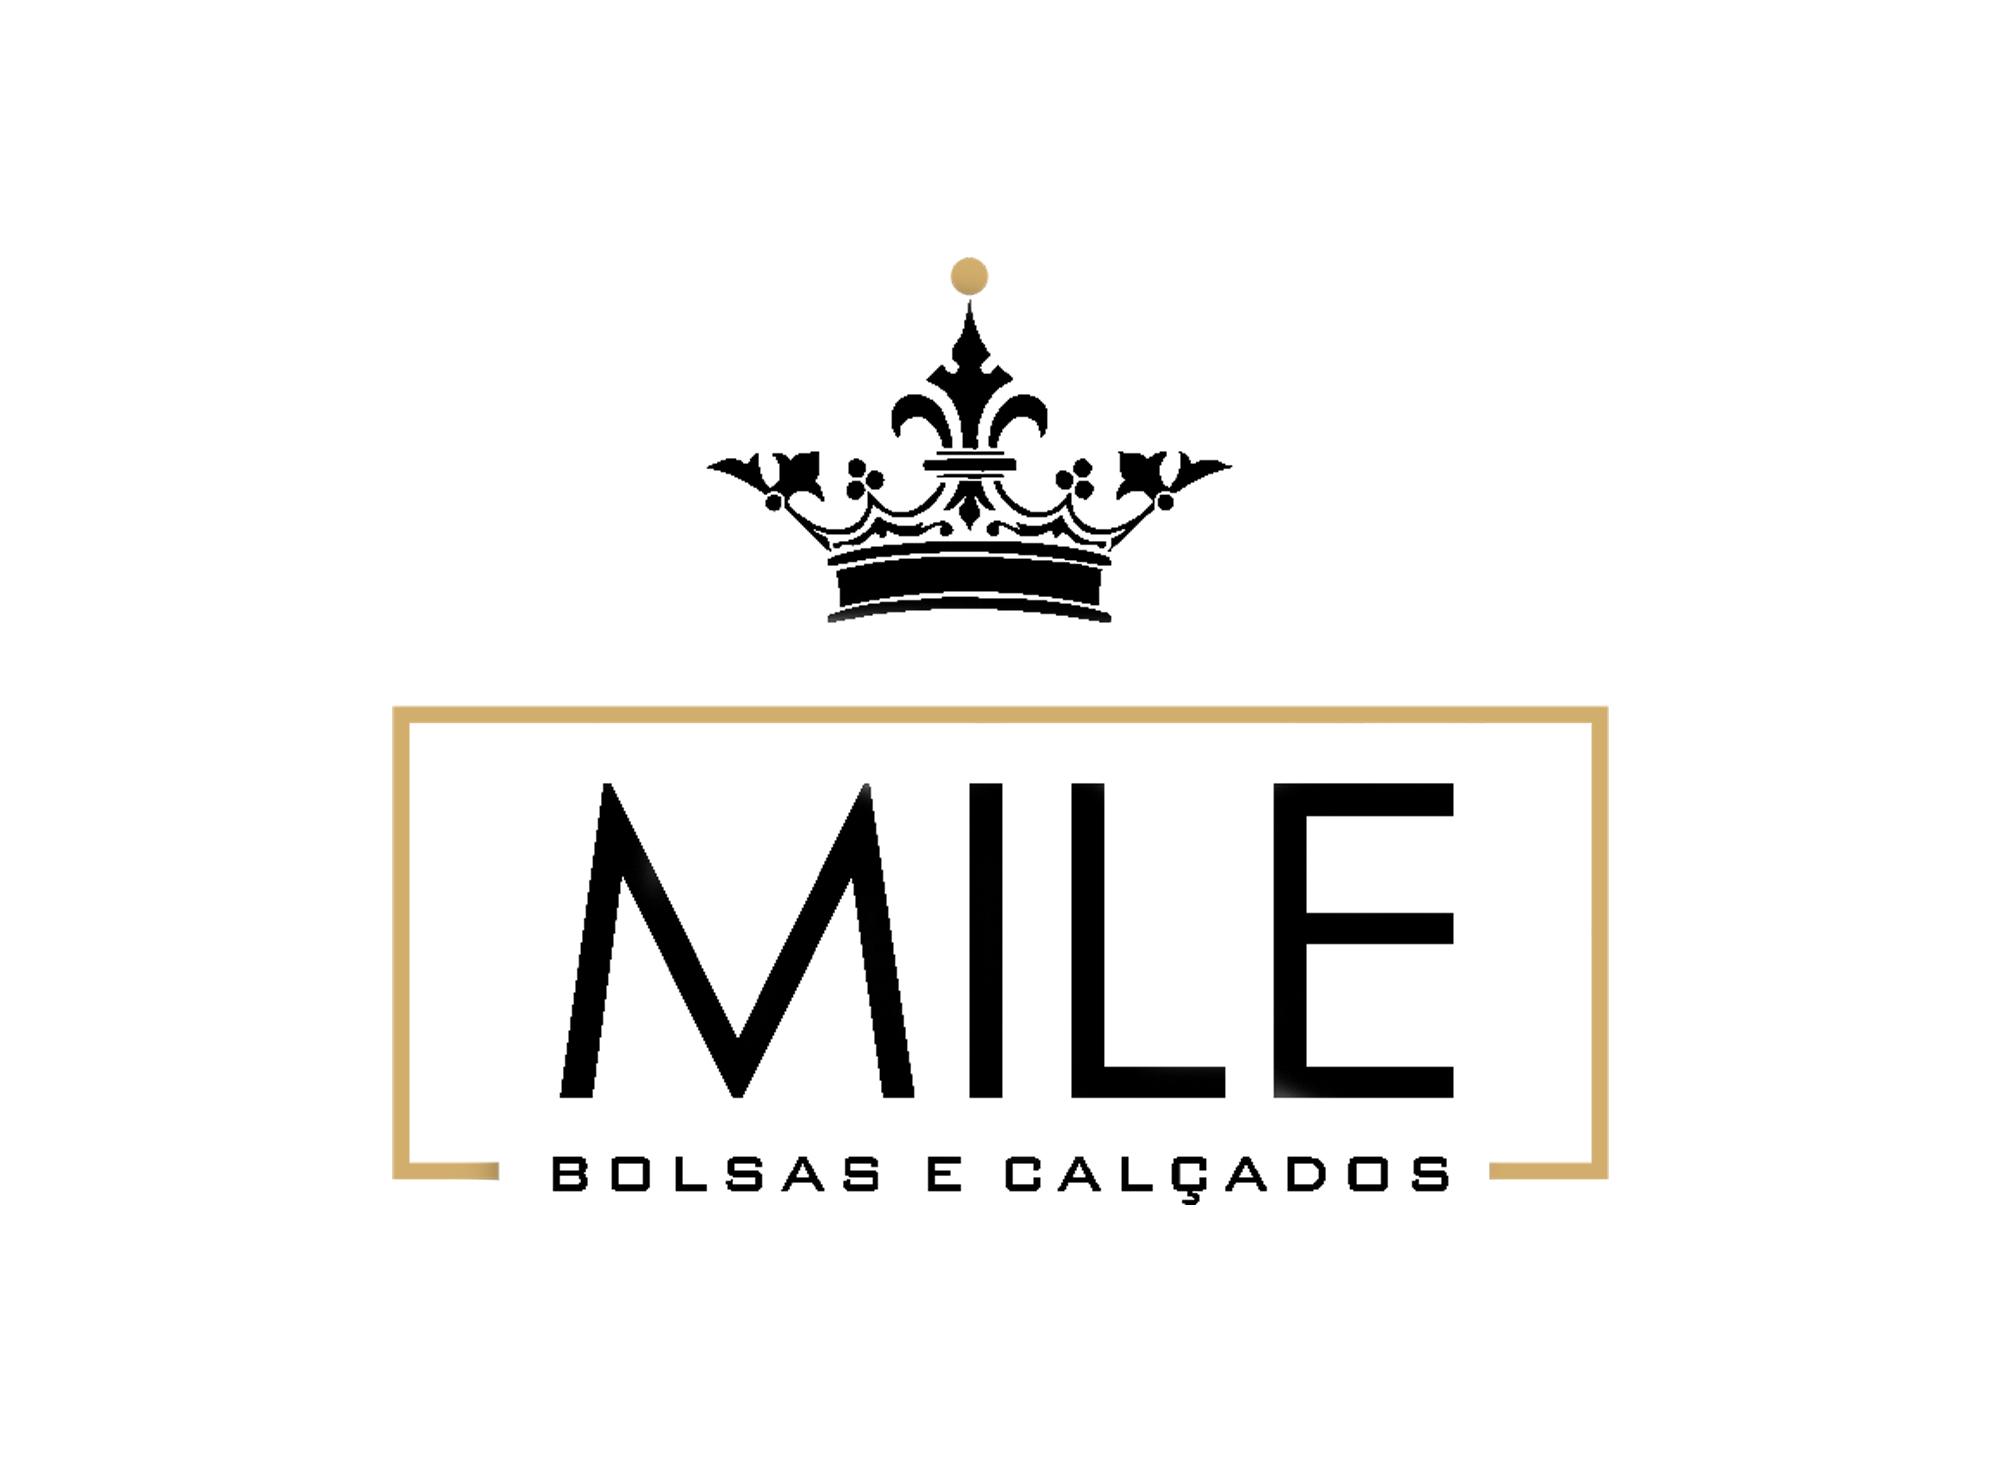 mile-bolsas-calcados-cliente-agencia-diretriz-digital-marketing-fortaleza